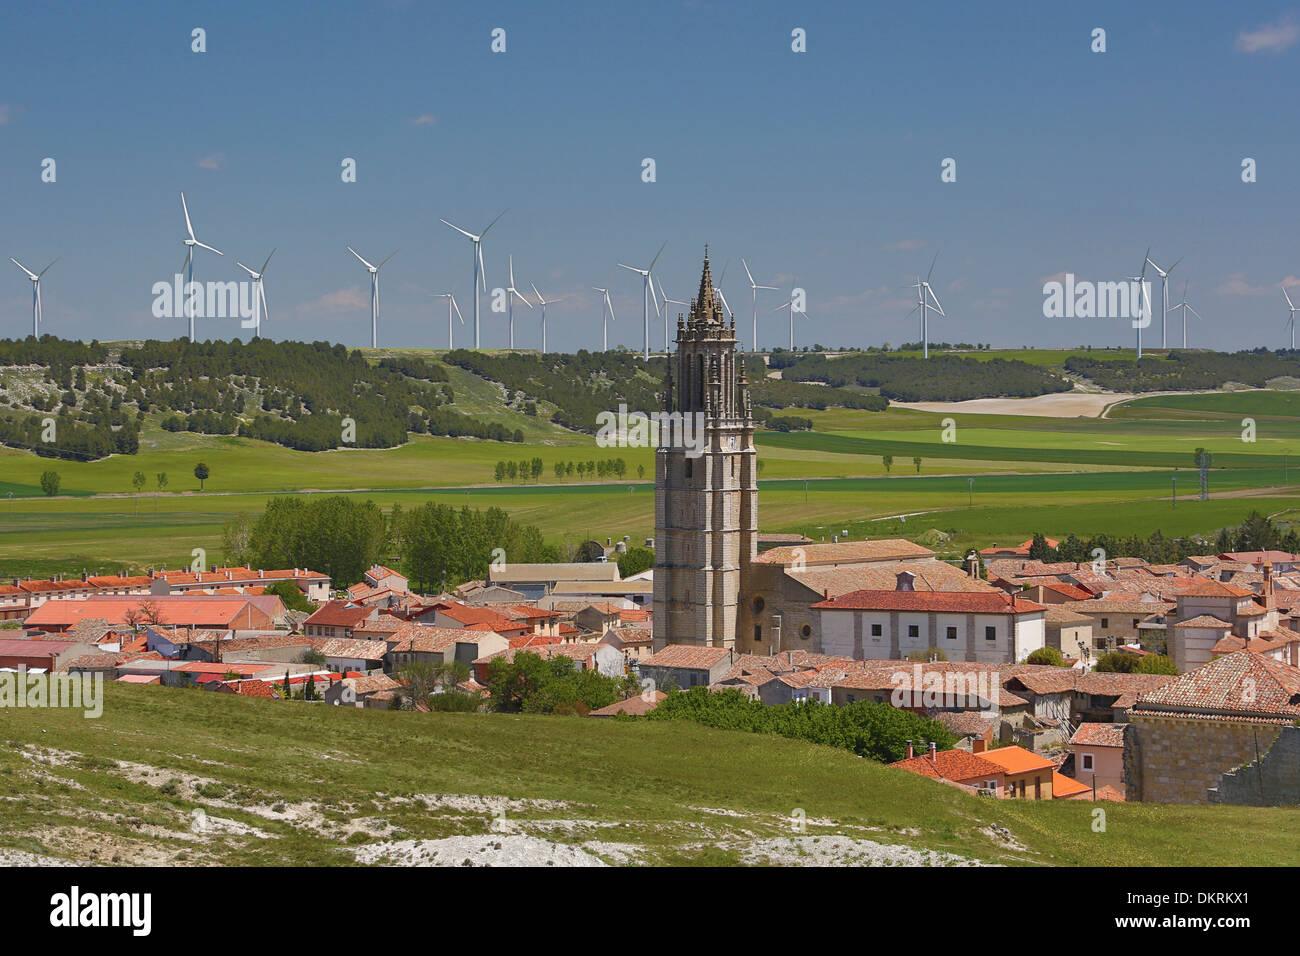 Ampudia, Castilla, Castile, Leon, Palencia, Province, belfry, church, city, energy, landscape, pueblo, Spain, Europe, wind - Stock Image